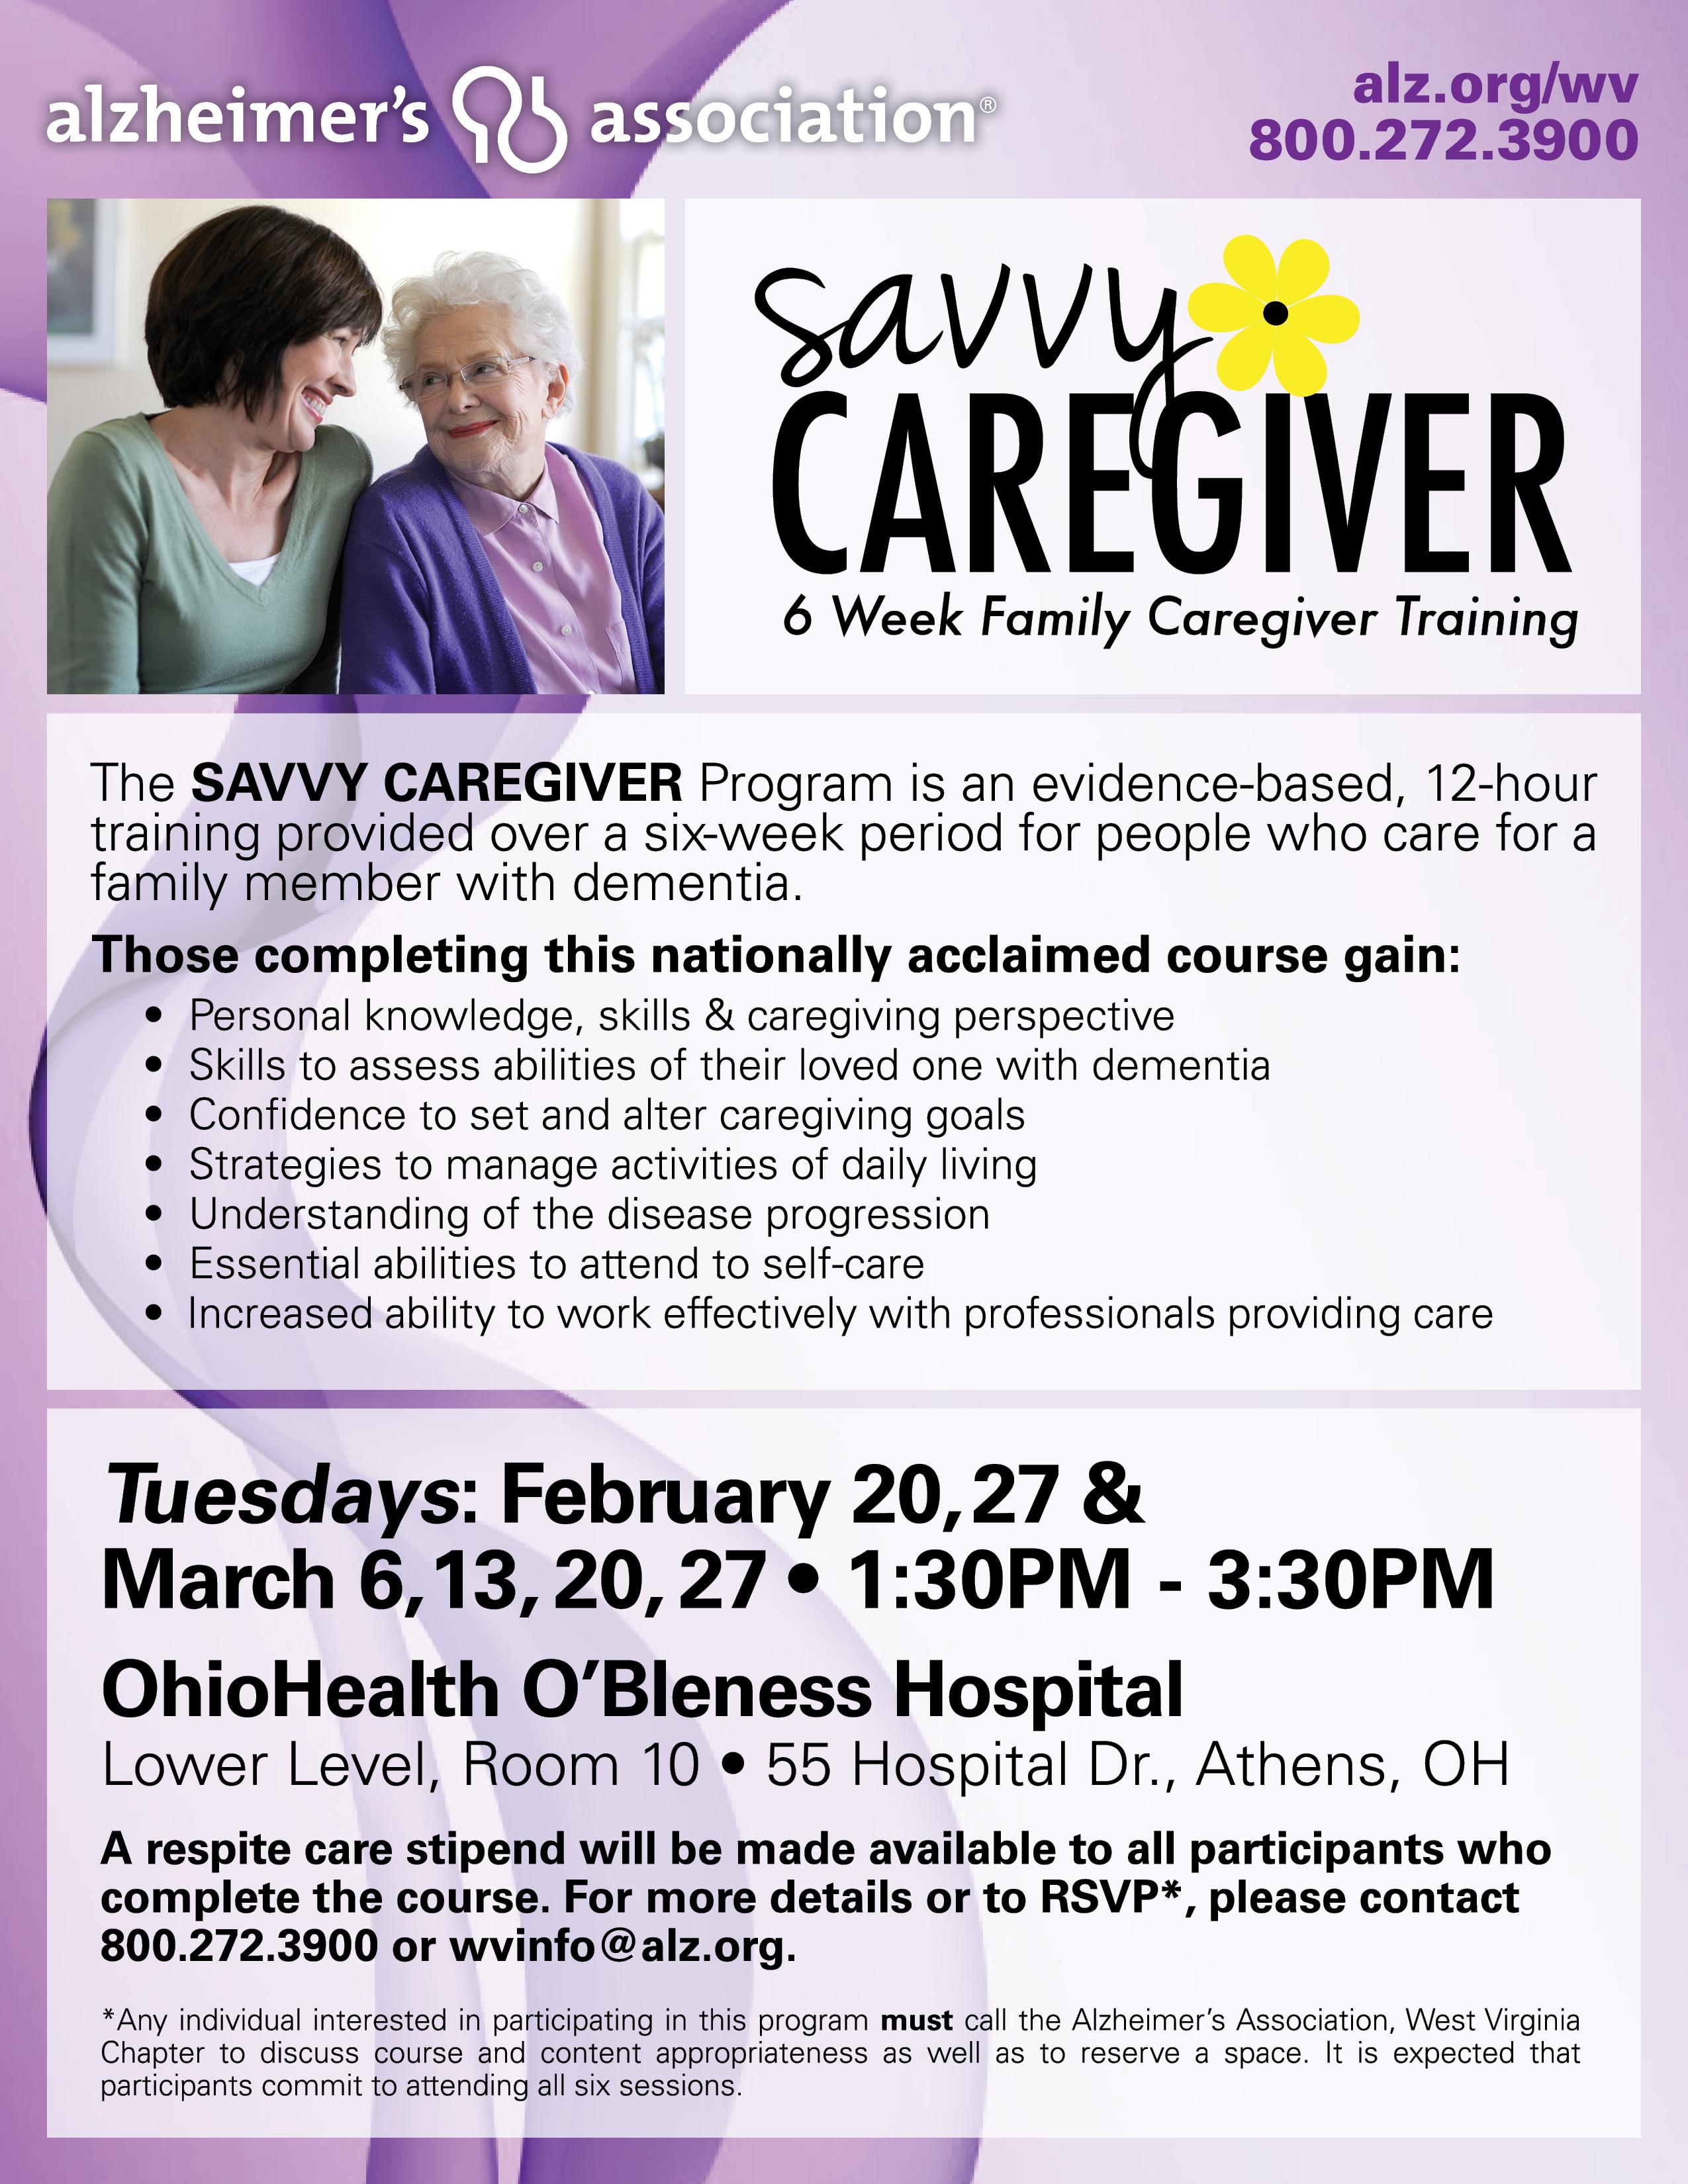 Savvy Caregiver Program - WOUB Public Media